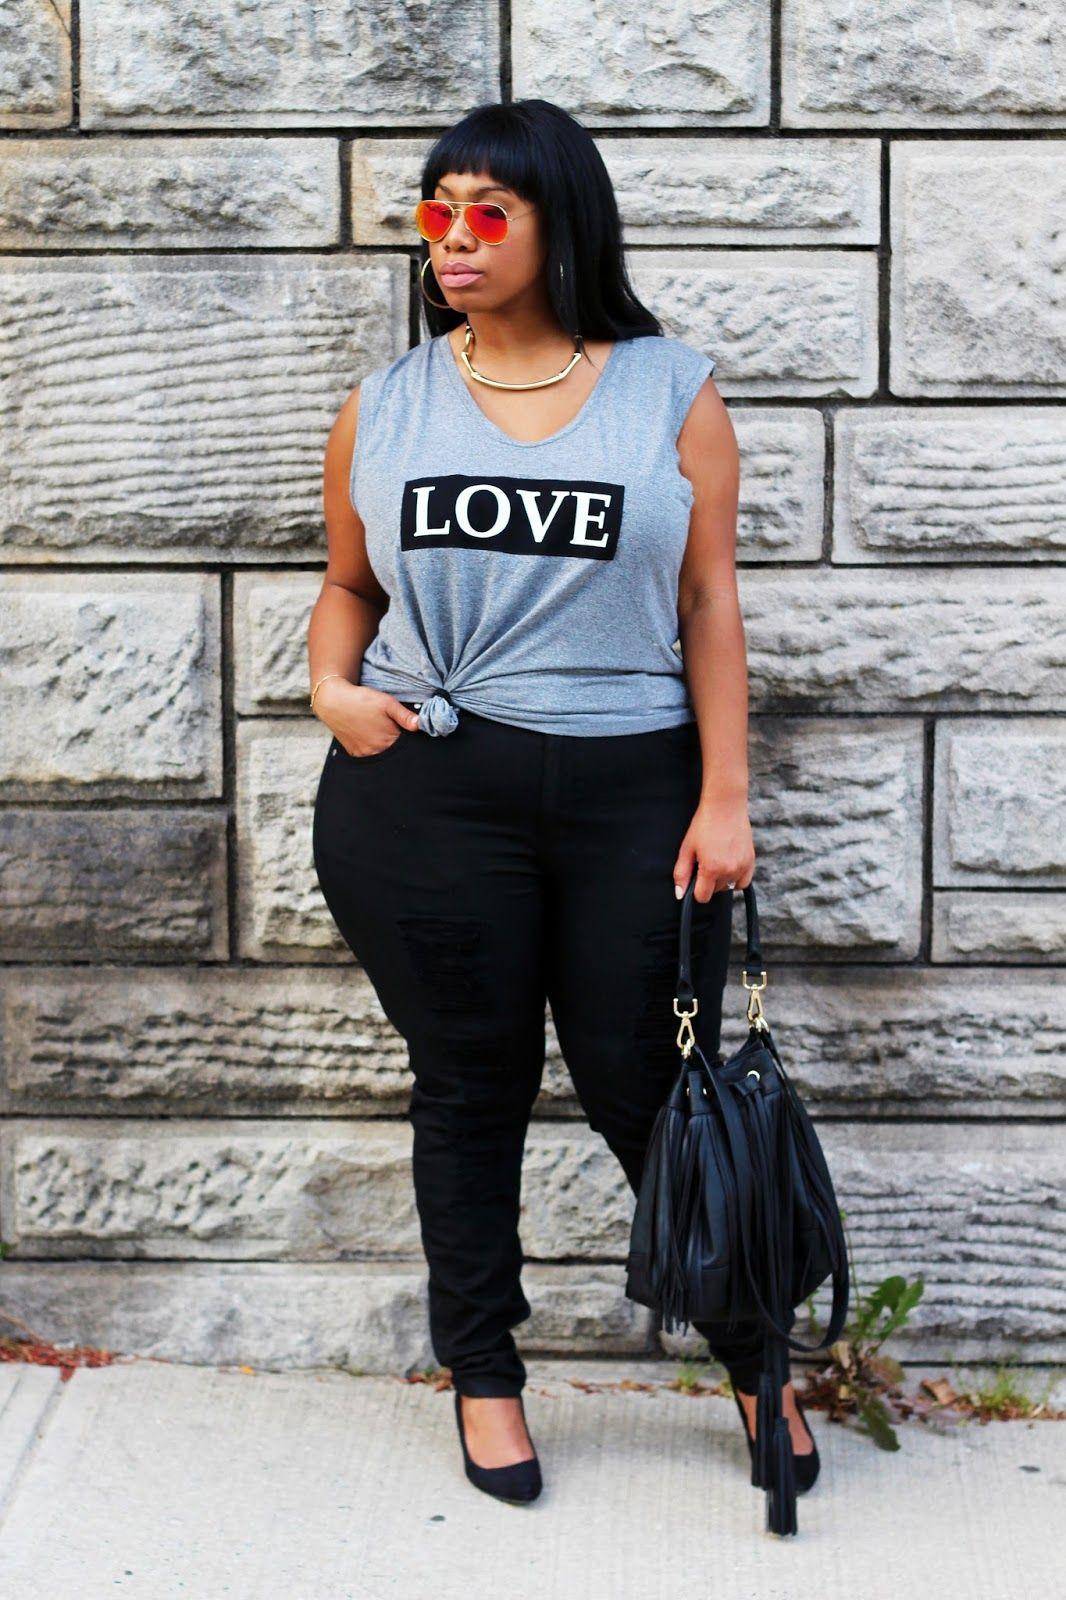 Kelly Augustine: All We Need is Love